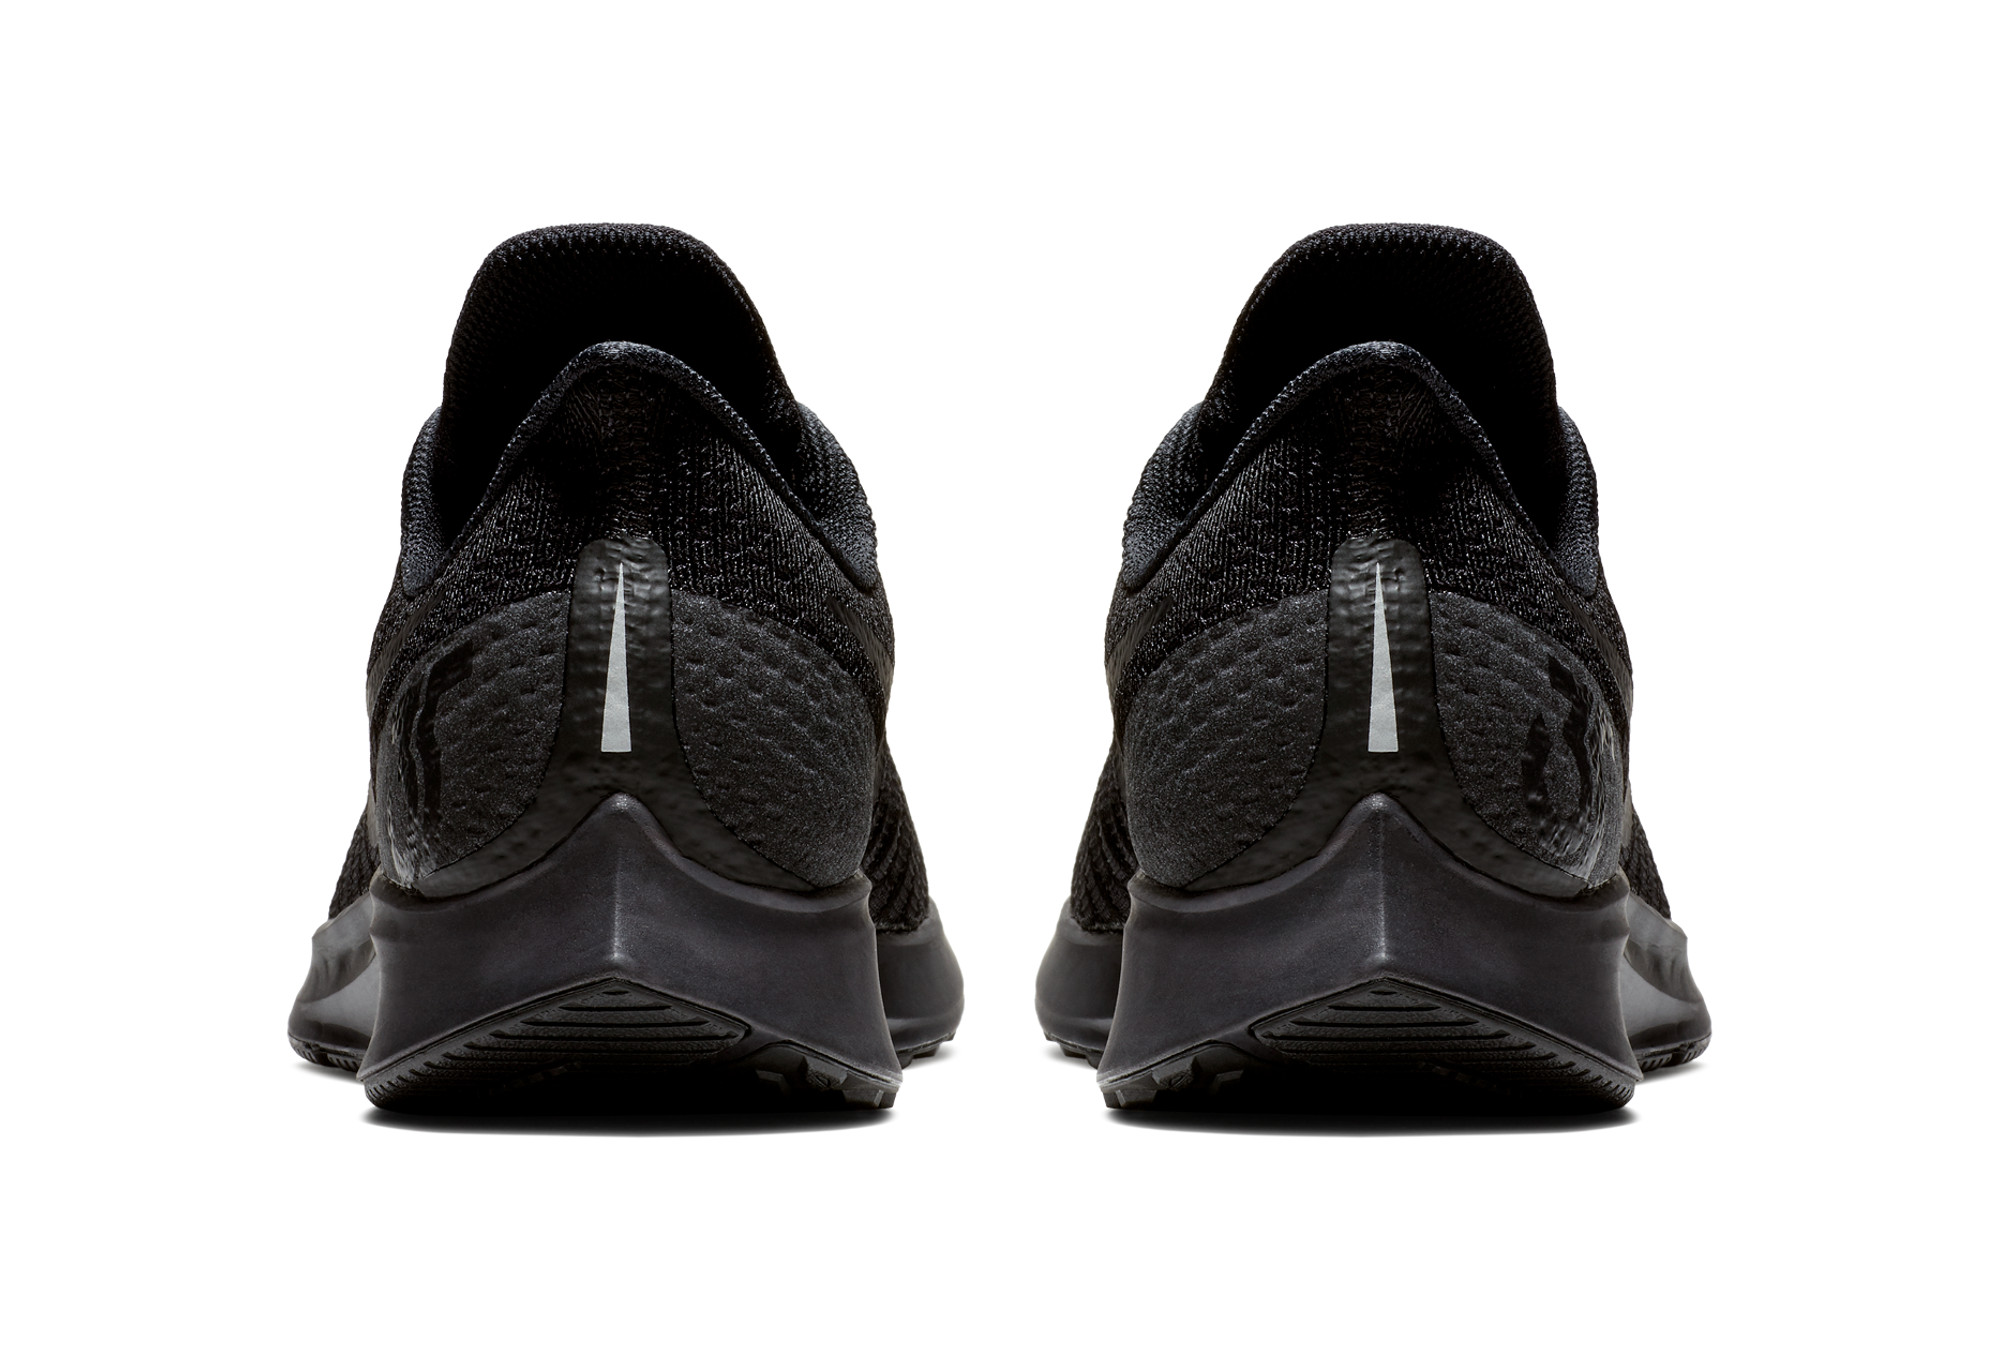 newest 61bd0 a047d Chaussures de Running Nike Air Zoom Pegasus 35 Noir